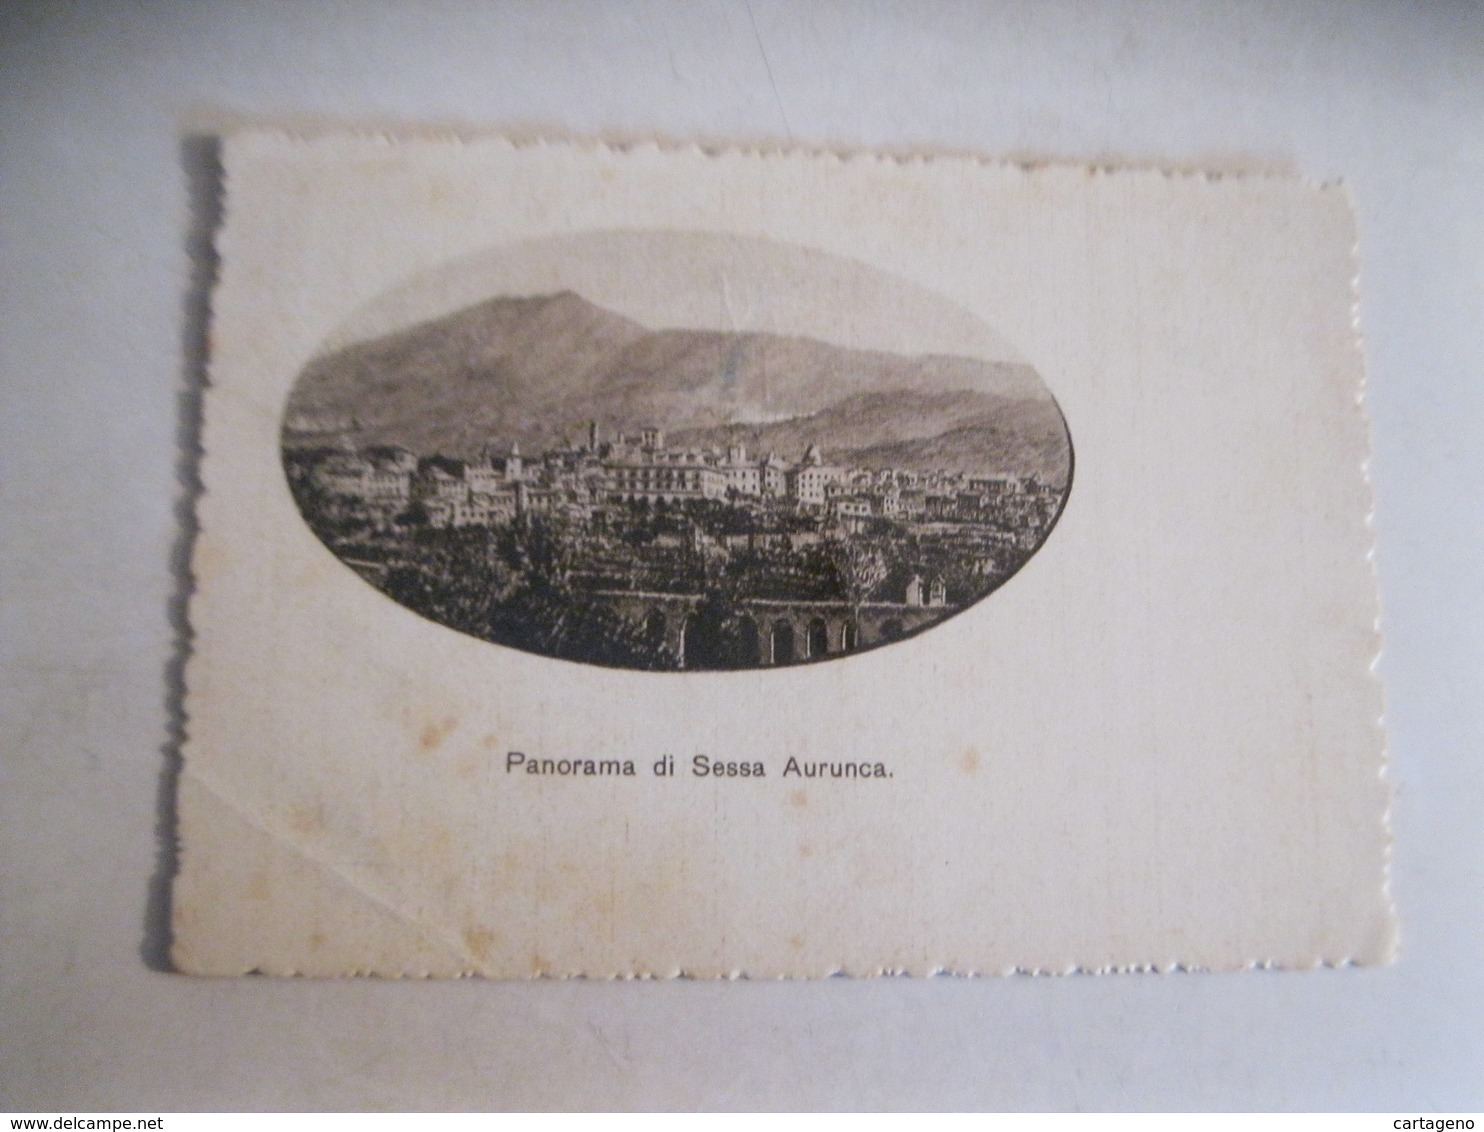 SESSA AURUNCA Panorama  Cartolina F/G Bianco E Nero   Viaggiata 1942 Francobollo Asportato - Italia